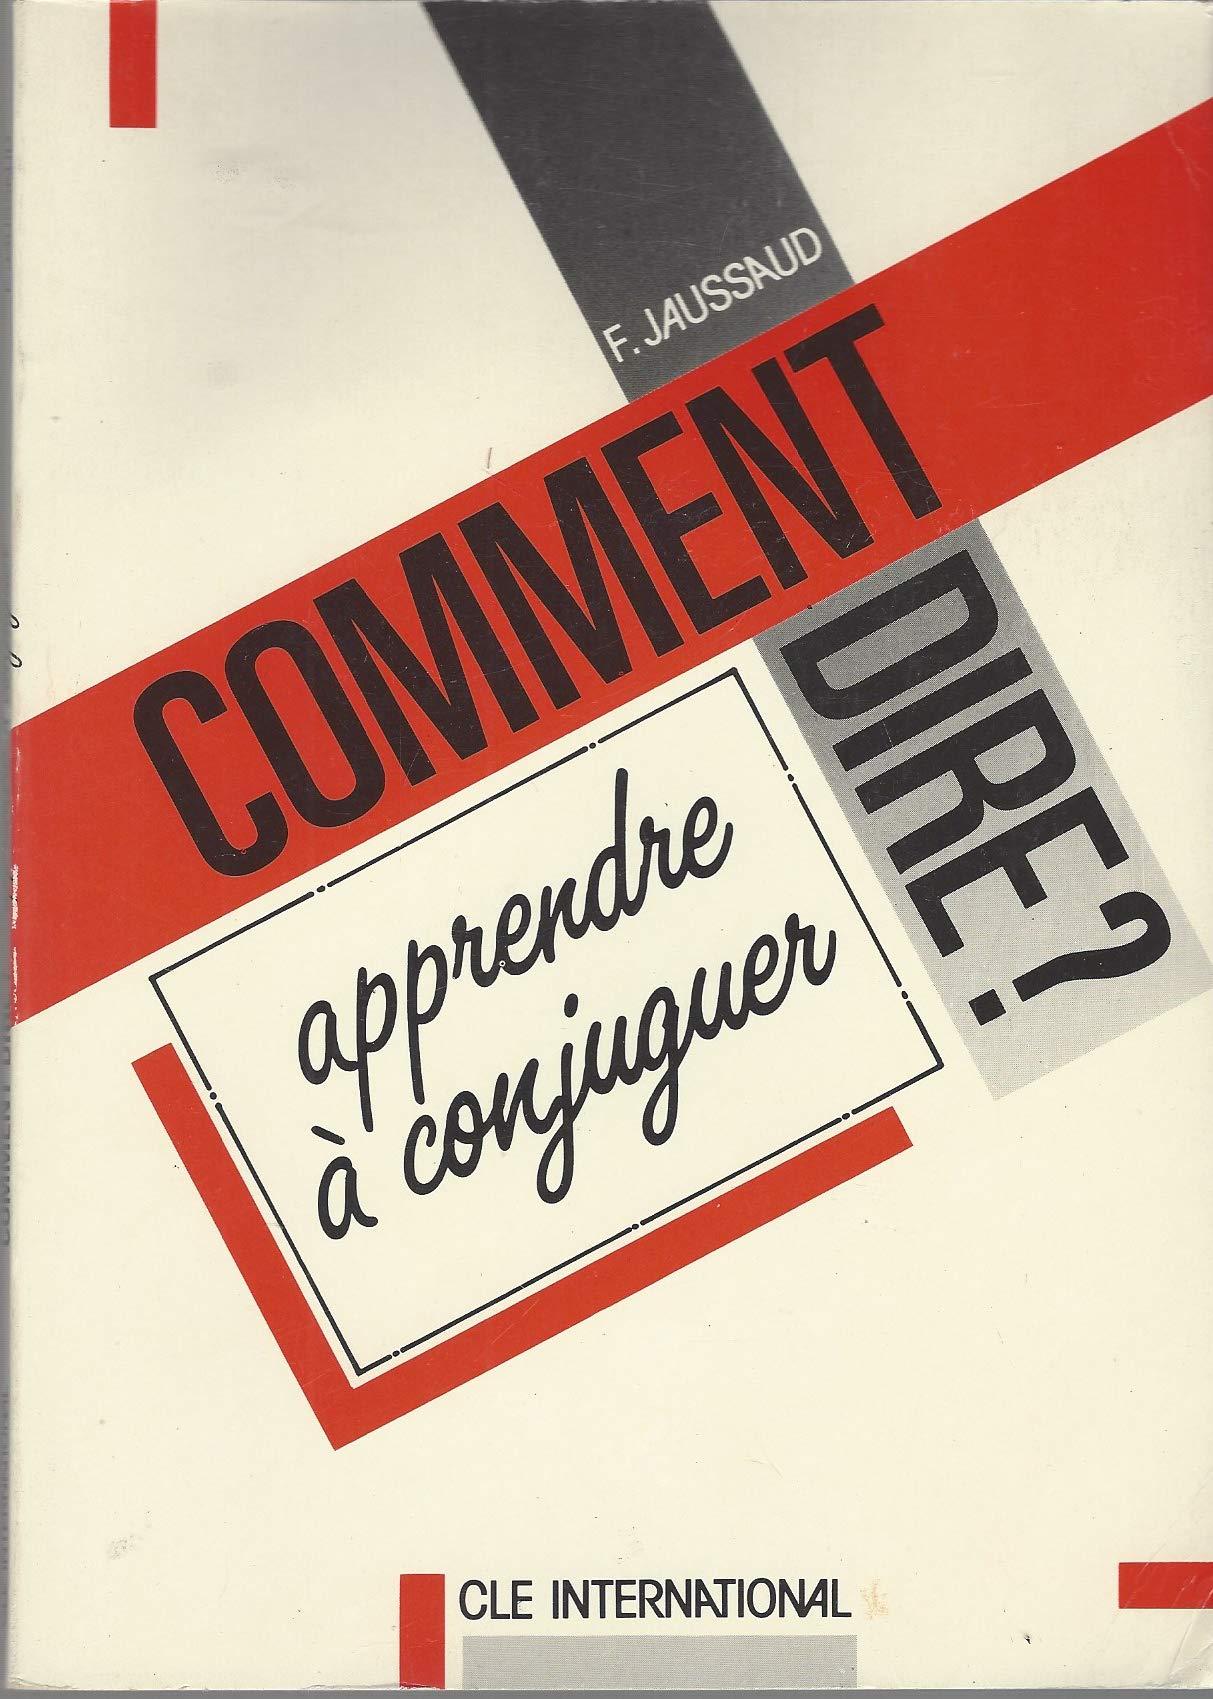 Comment Dire Level 2 Apprendre A Conjuguer Amazon Es Job Sinjan Berger Spiegeleer Libros En Idiomas Extranjeros